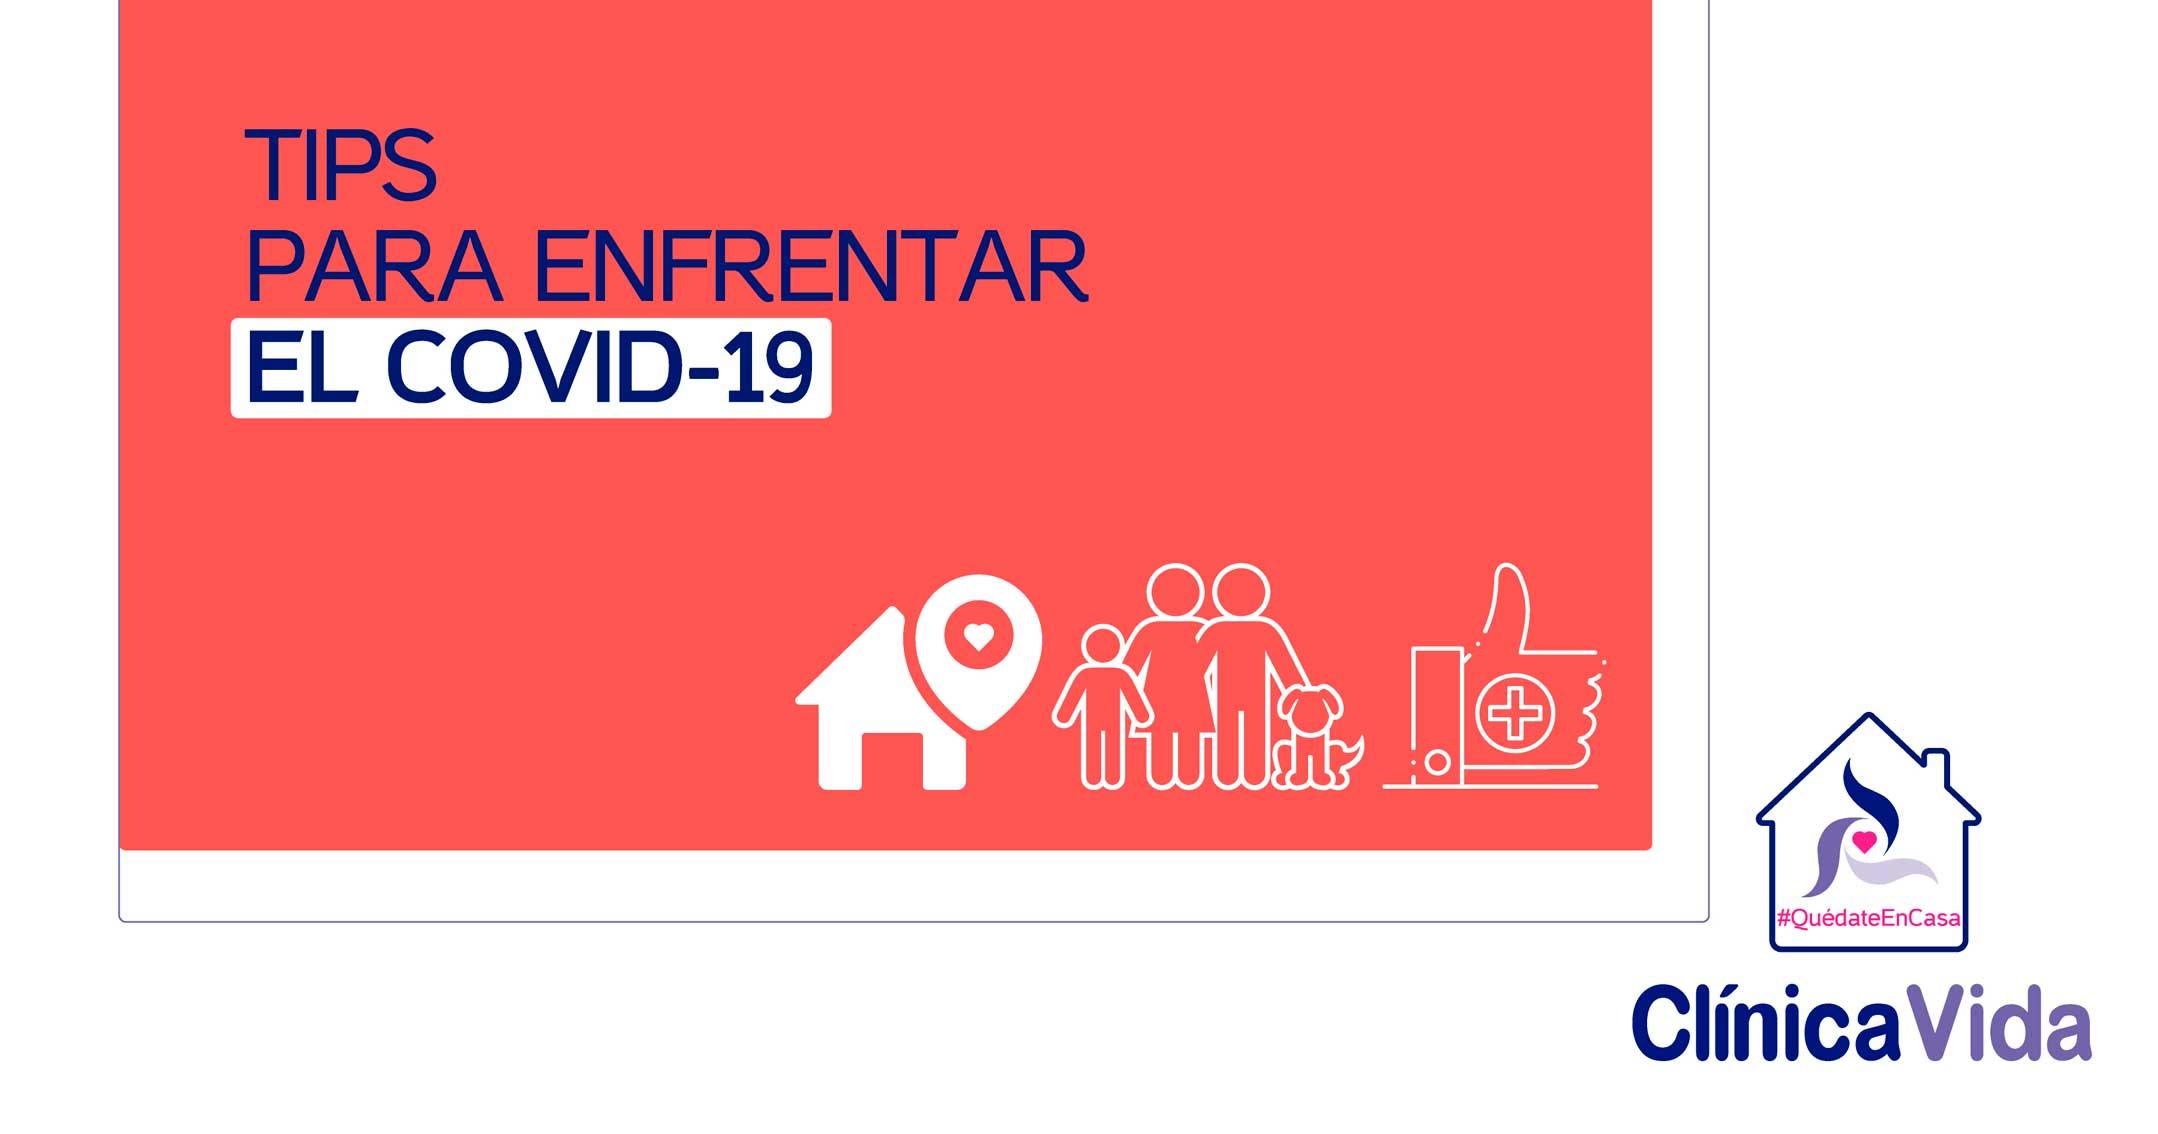 TIPS PARA ENFRENTAR EL COVID-19